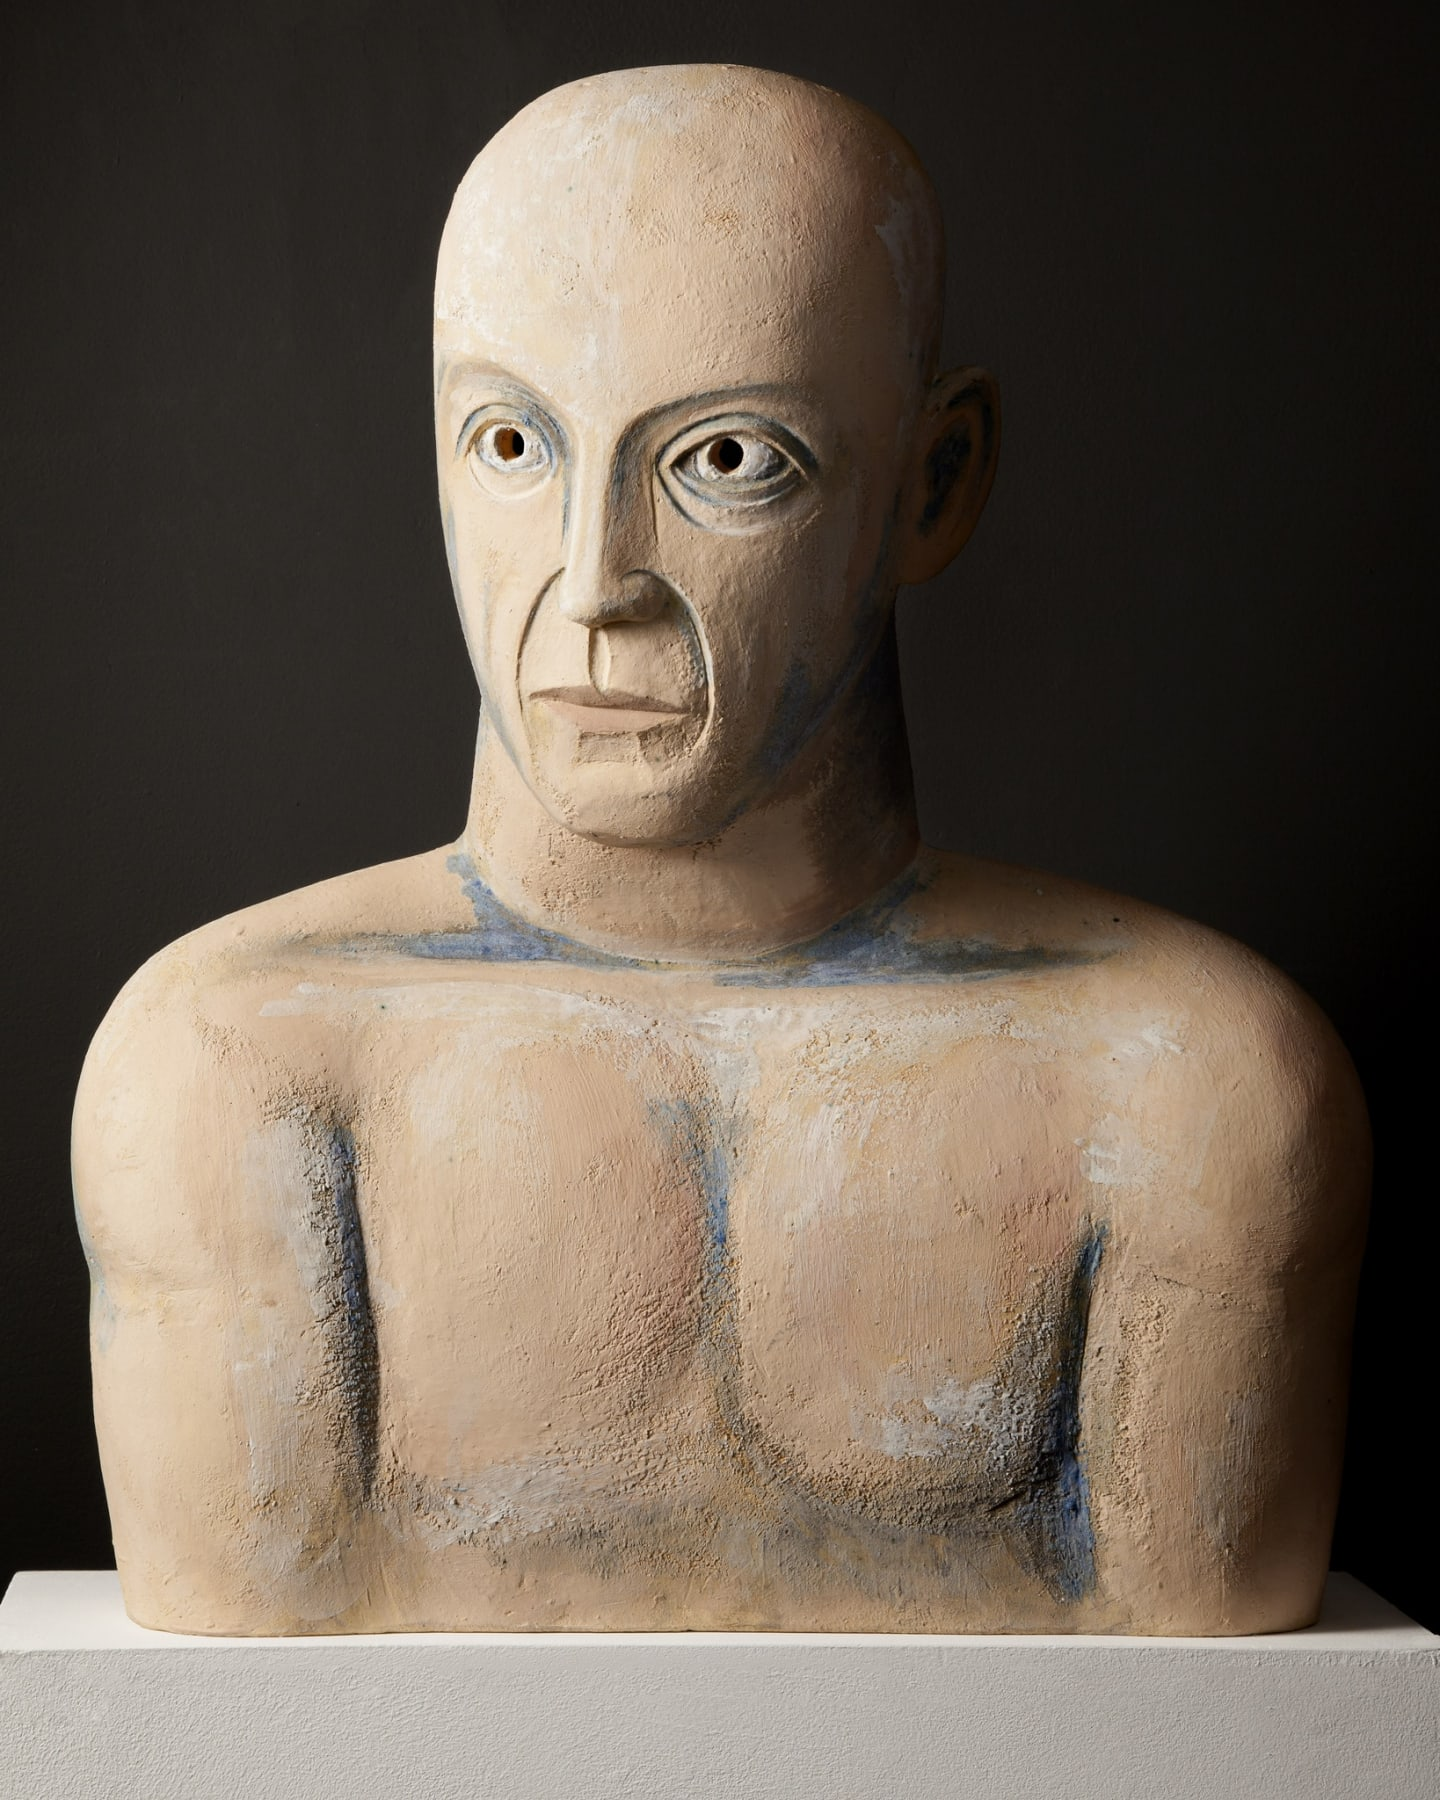 Glenys Barton The Man Himself (Picasso)